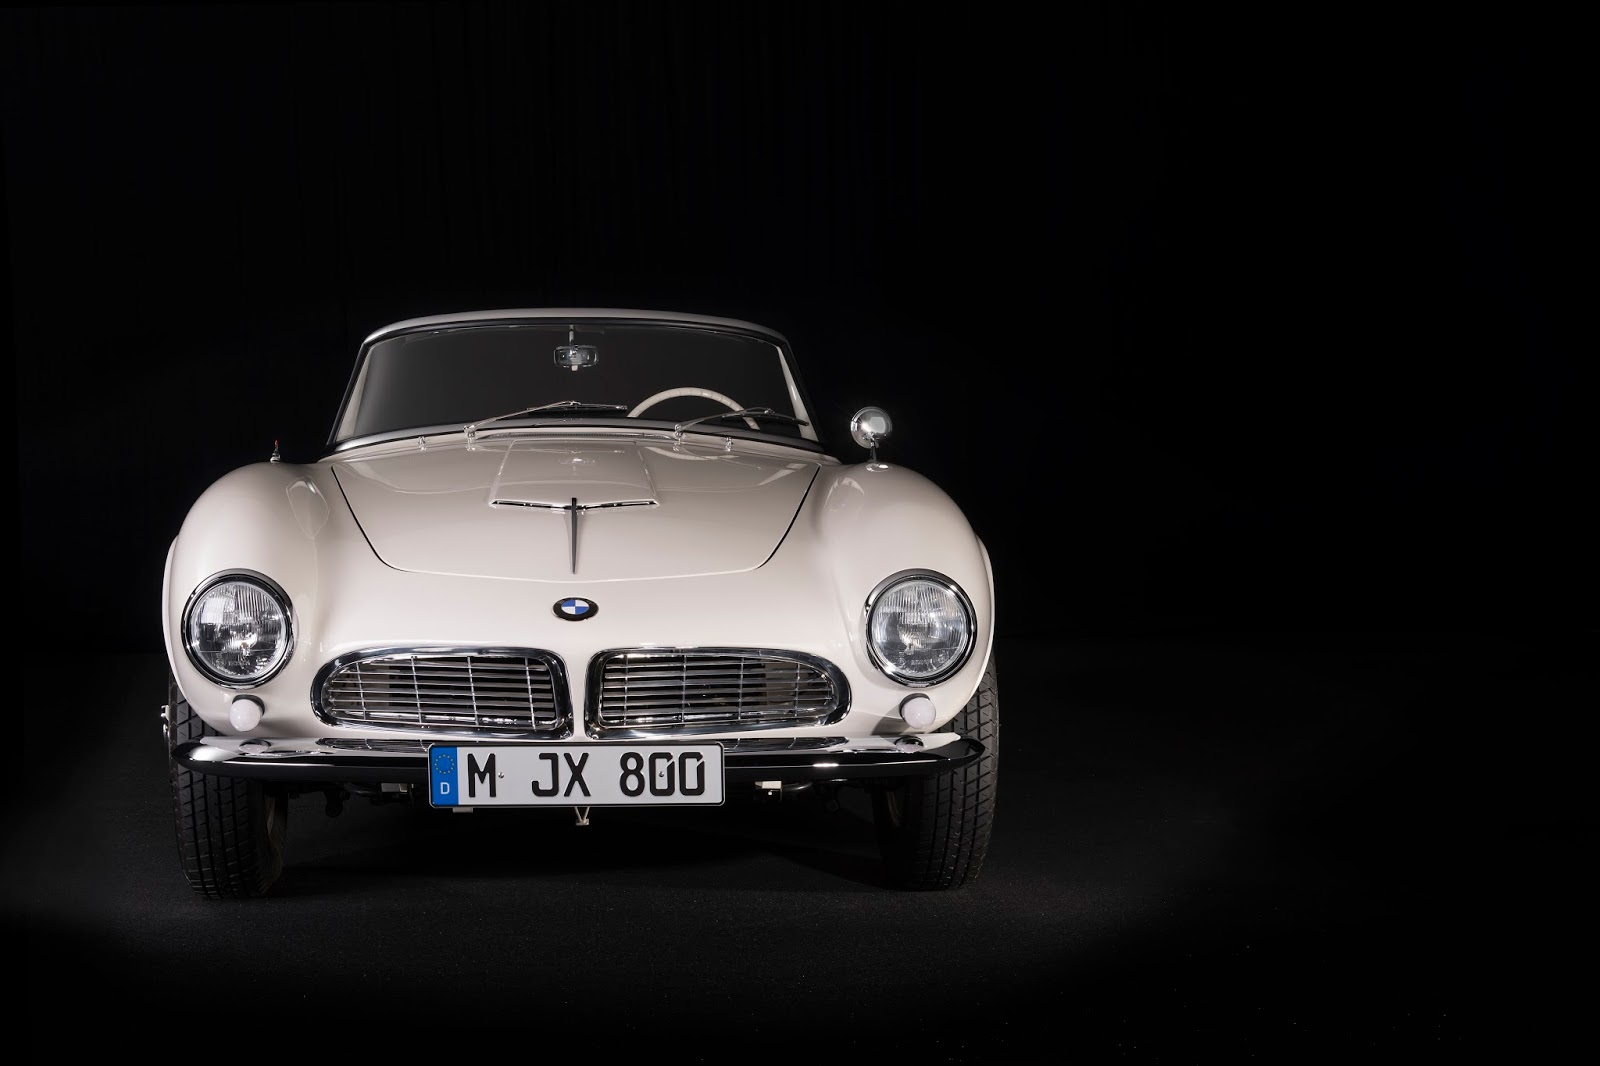 P90229726 highRes elvis bmw 507 08 201 Η επιστροφή της μυθικής BMW 507 του Elvis στο Concours d'Elegance, Pebble Beach autoshow, BMW, BMW 507, Classic, Concours d'Elegance, Roadster, zblog